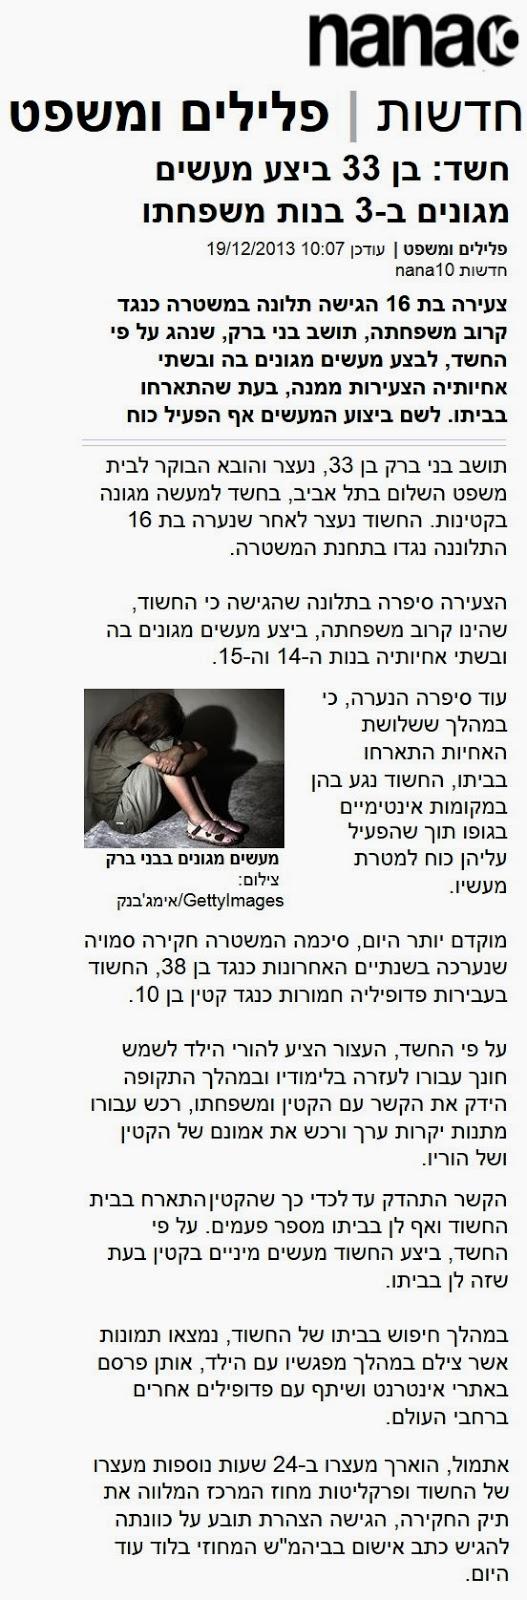 http://news.nana10.co.il/Article/?ArticleID=1025424